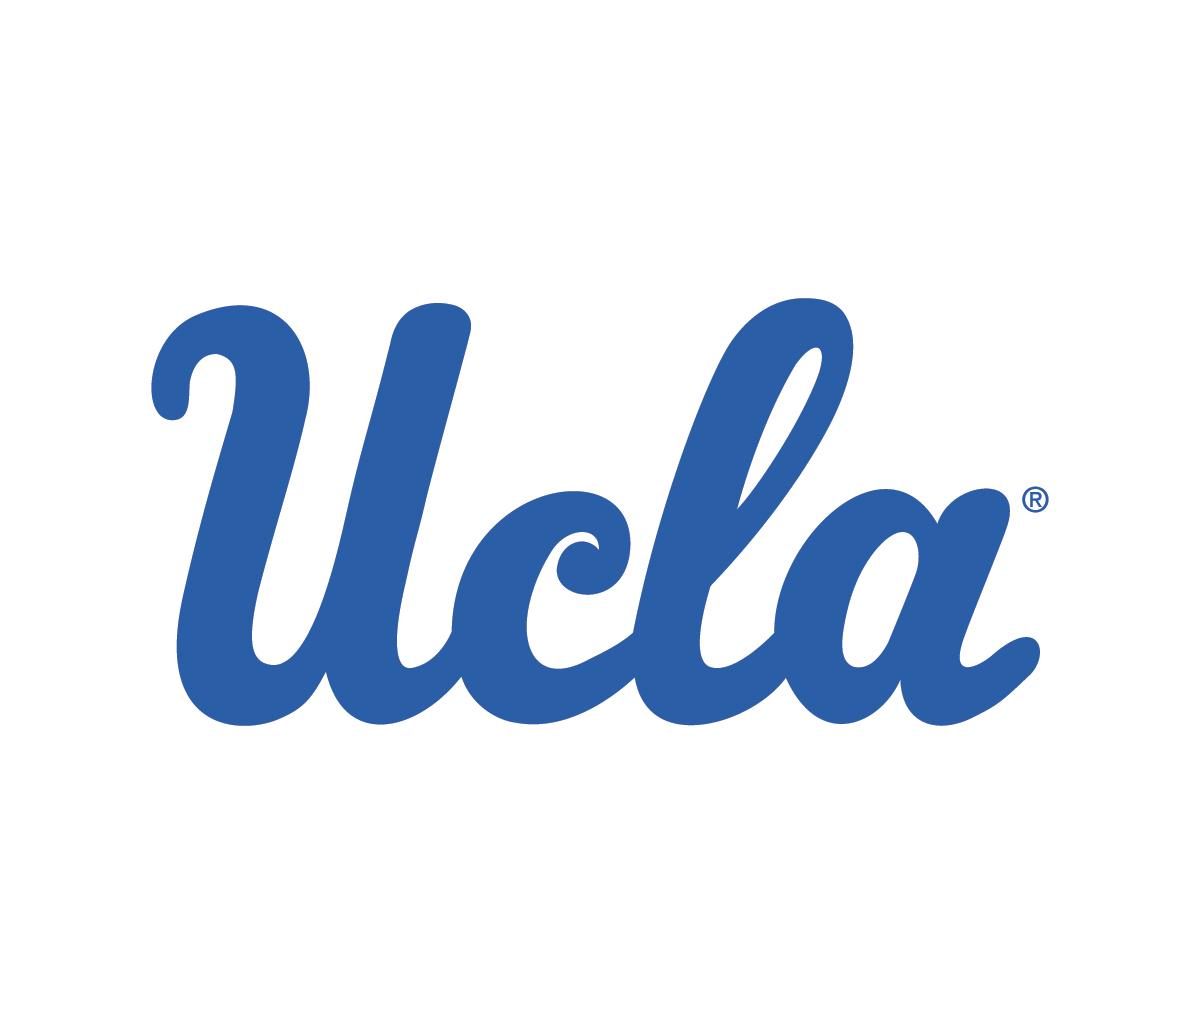 UCLA_WW_PRI_LOGO_ON_WHT-1200.jpg